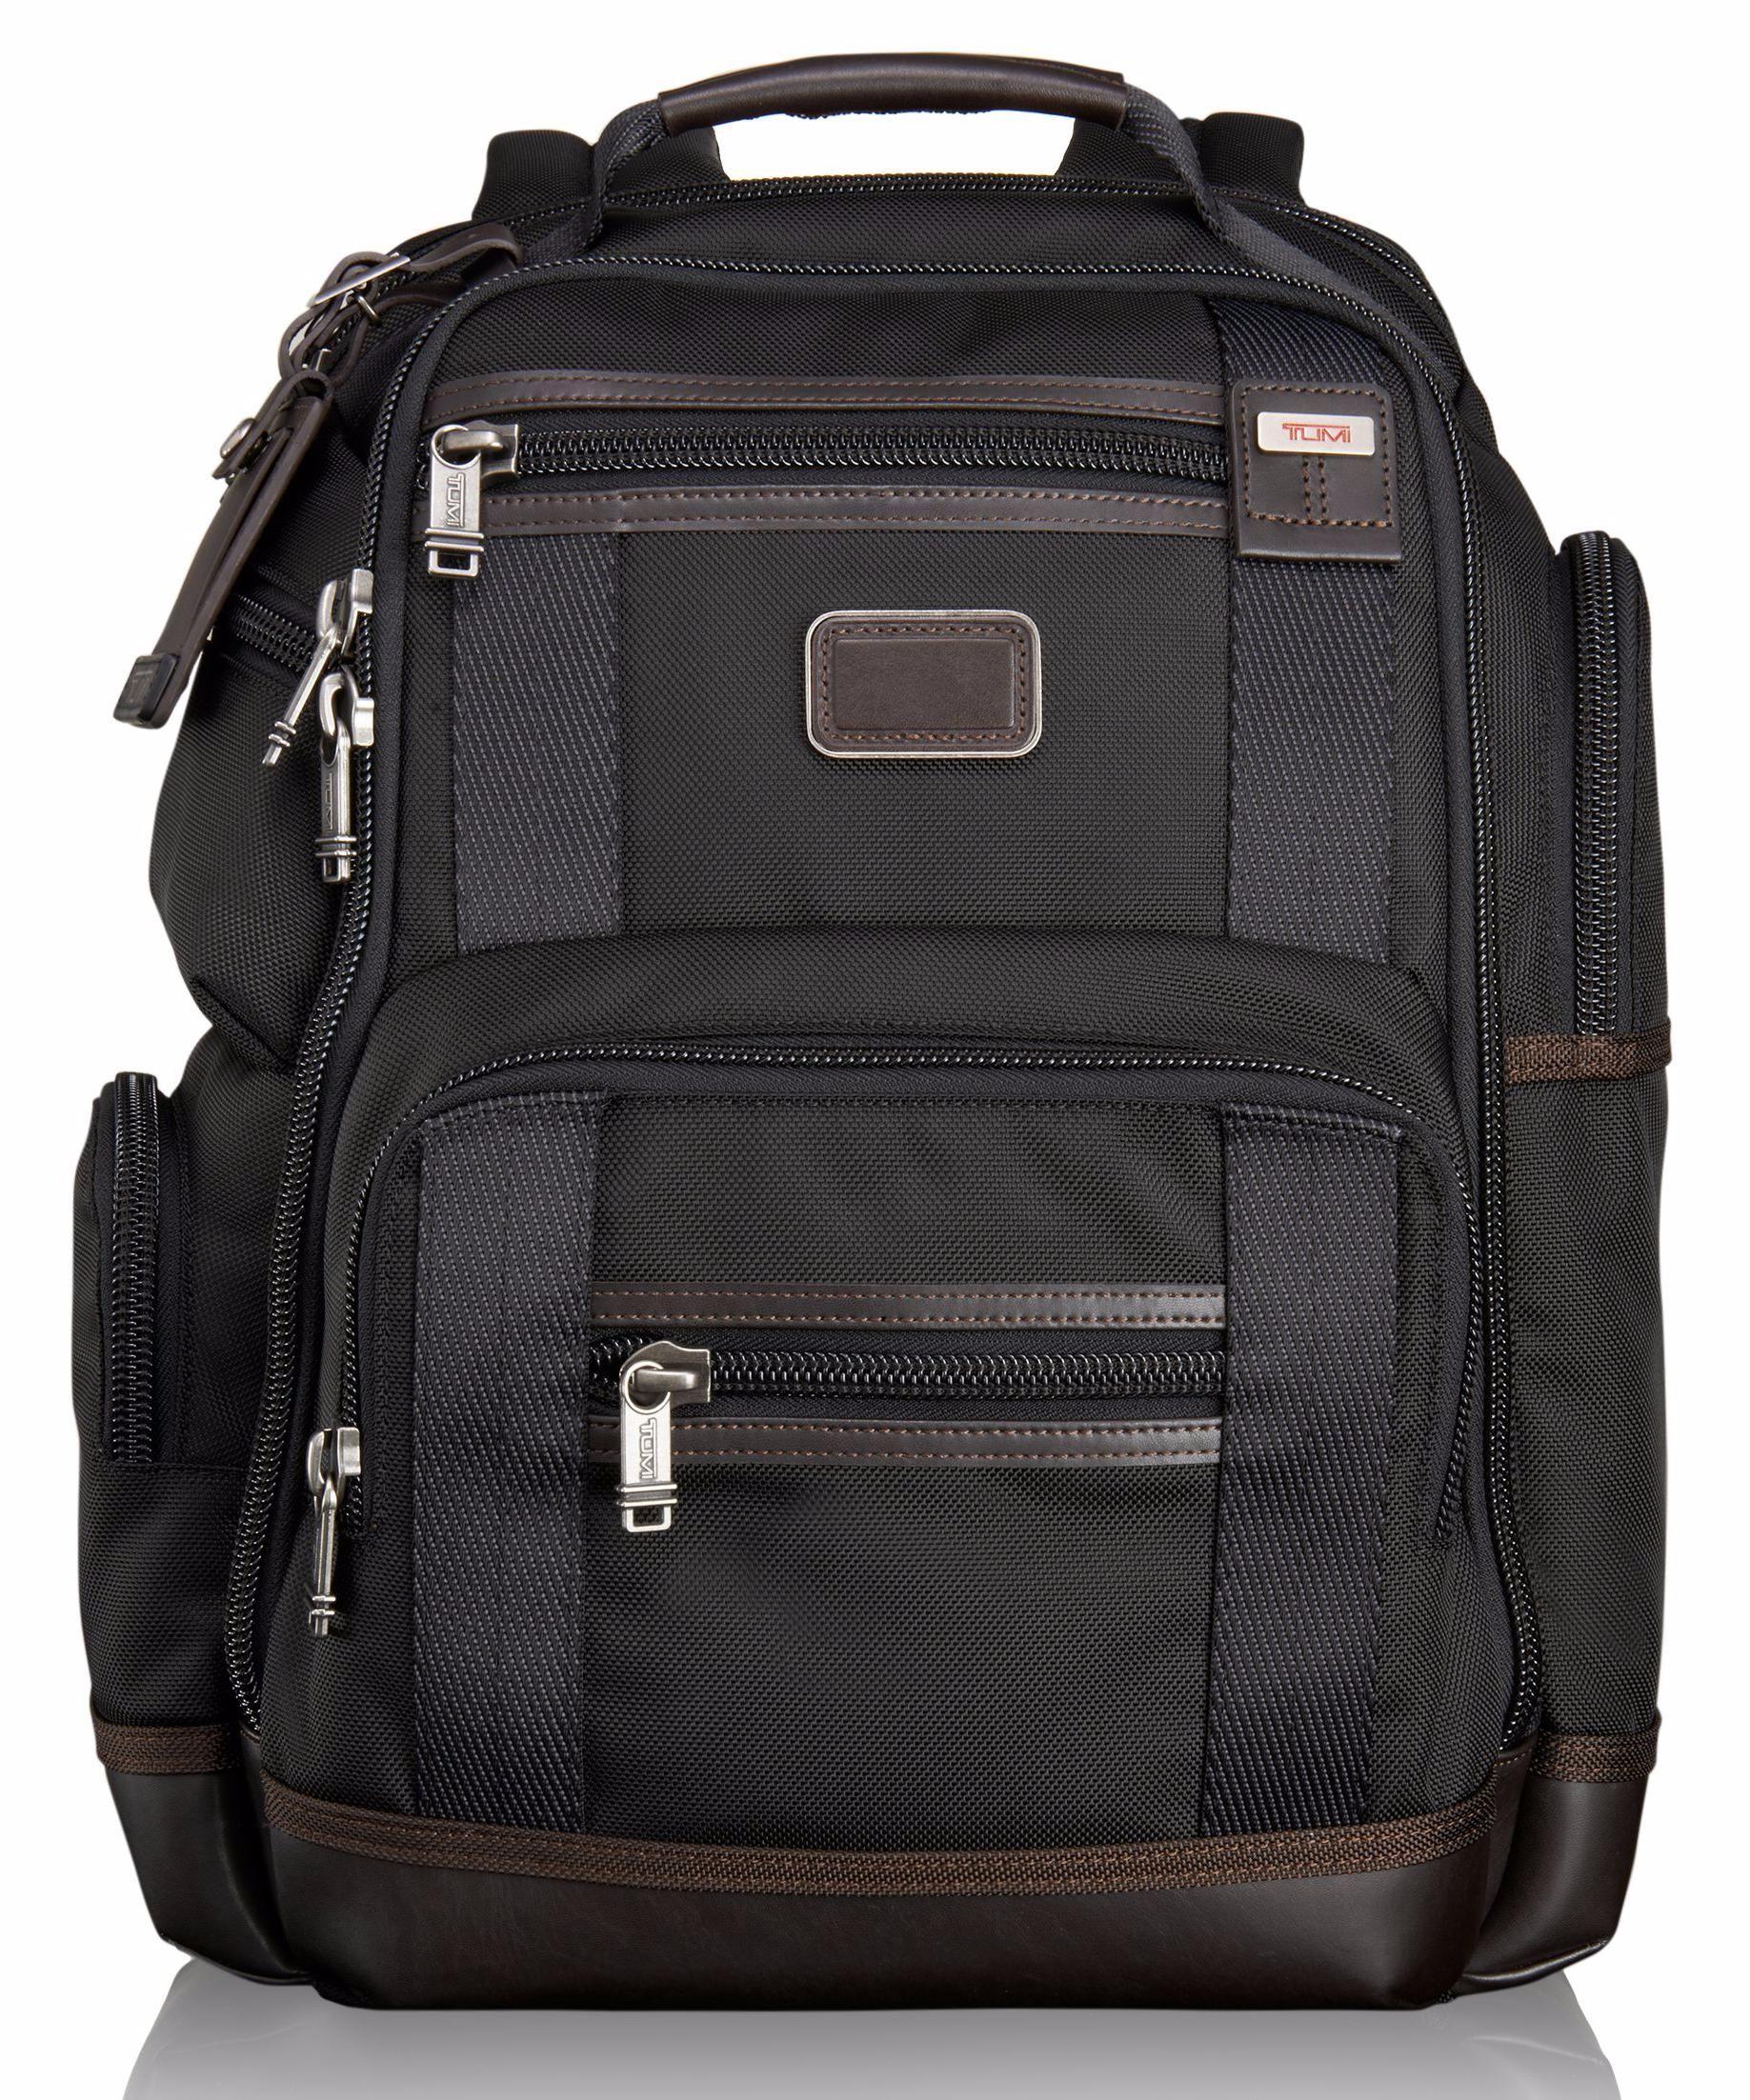 Рюкзак tumi 222681hk2 alpha bravo knox backpack обзор рюкзака десантный кенгуру